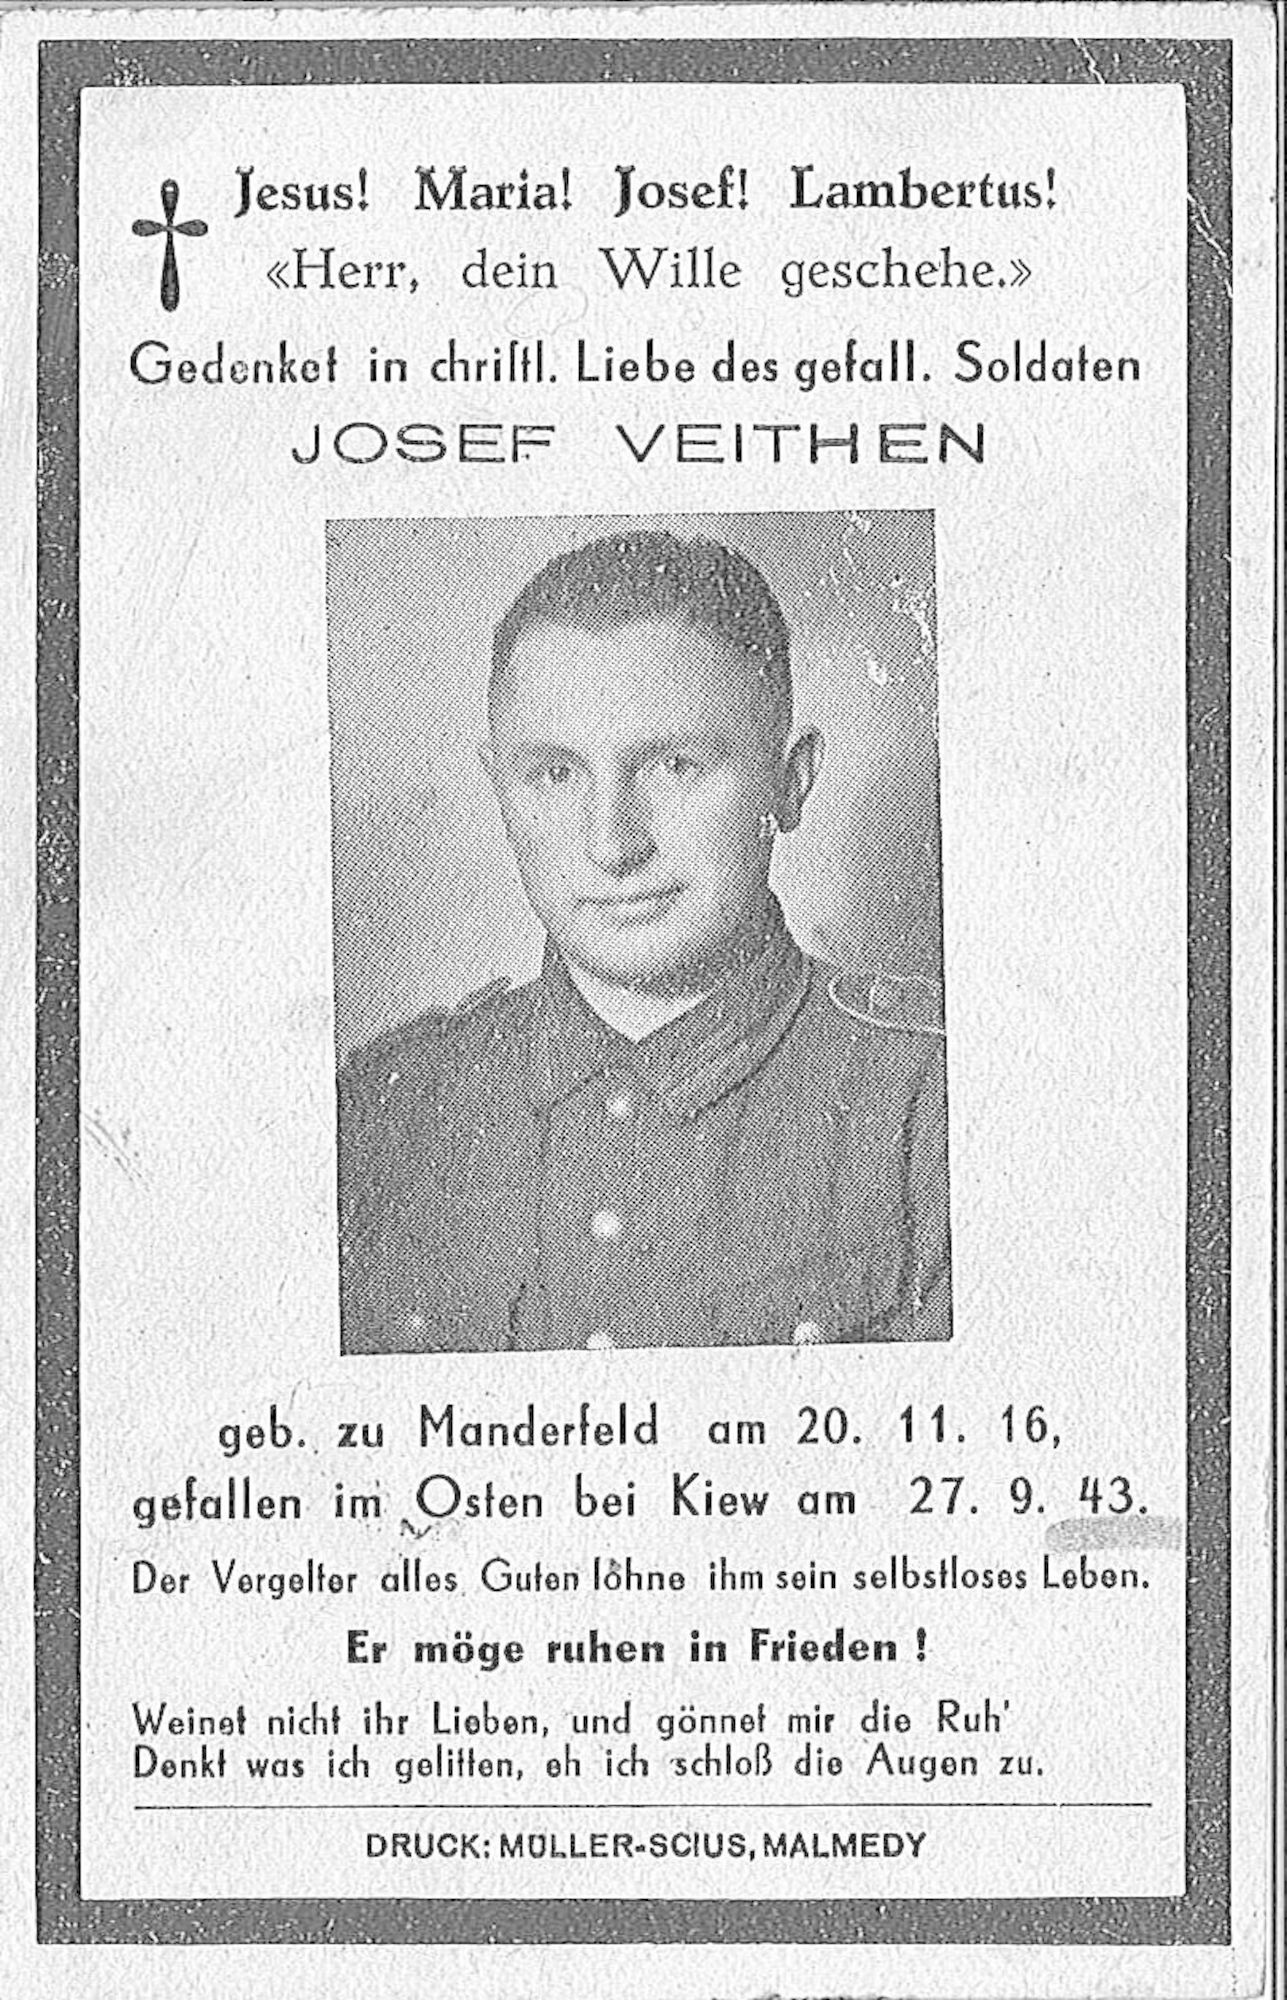 Josef Veithen